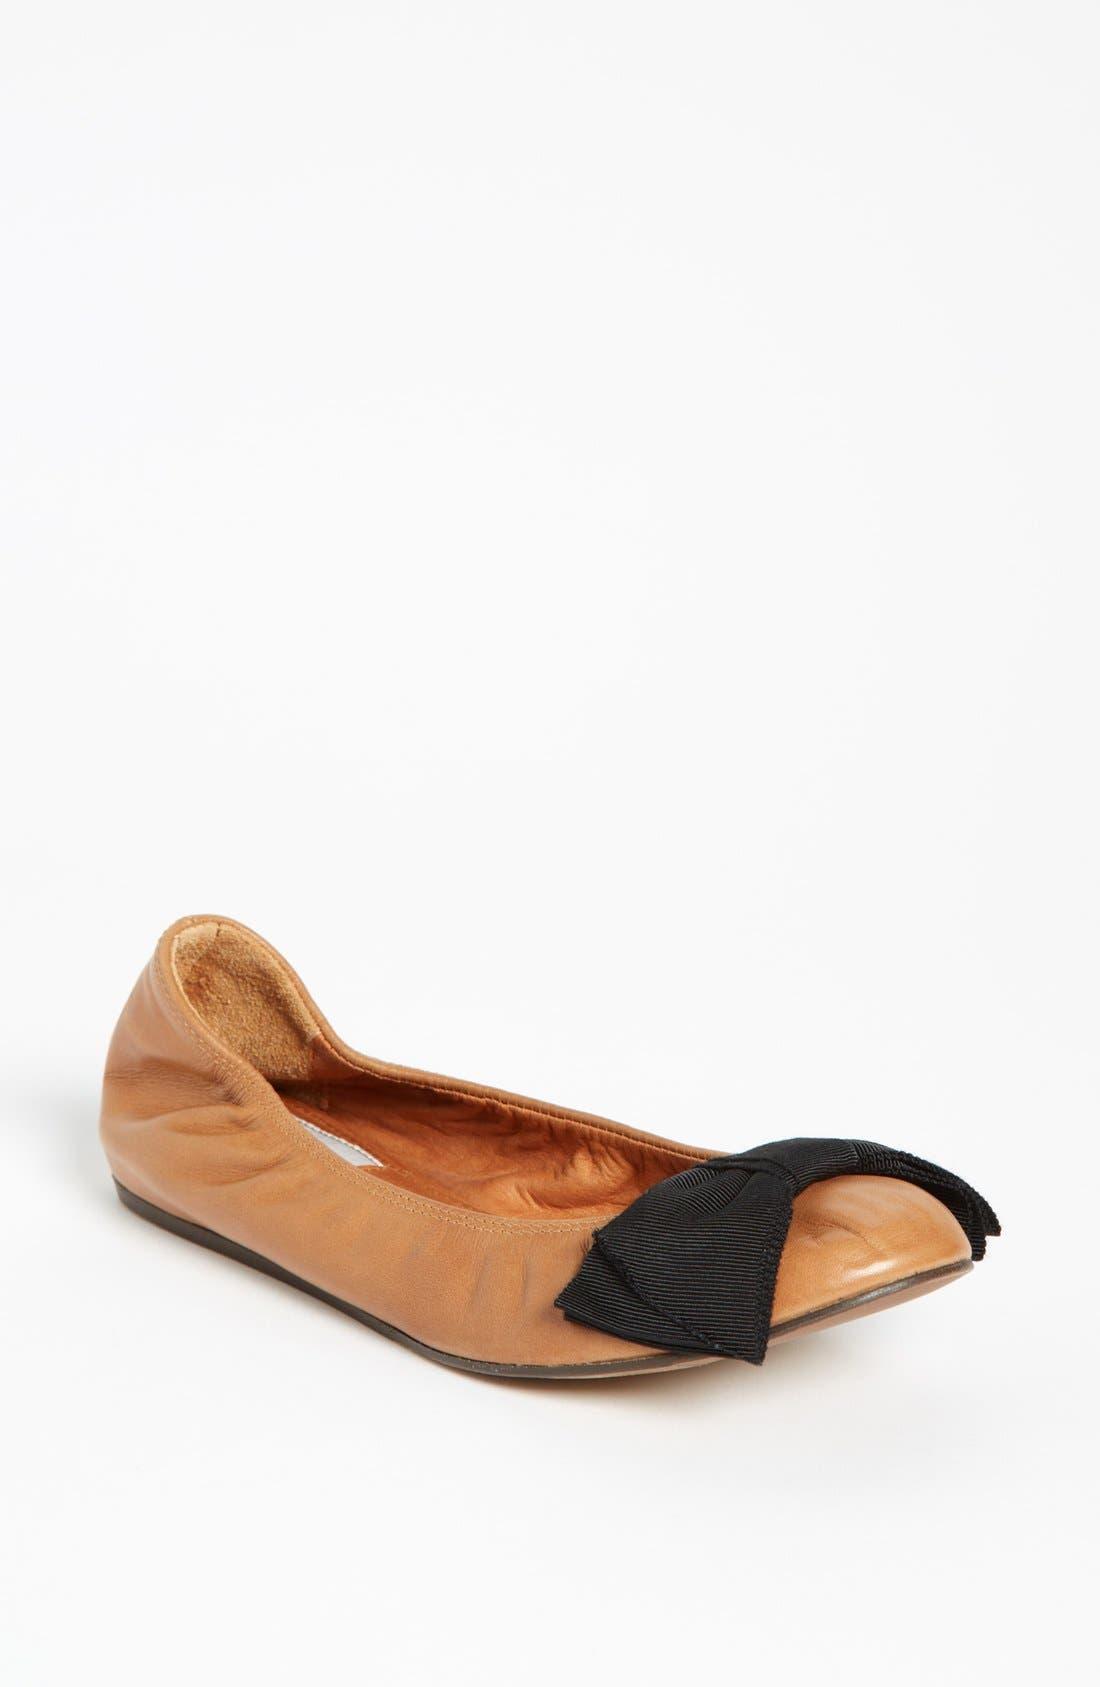 Alternate Image 1 Selected - Lanvin Bow Detail Ballet Flat